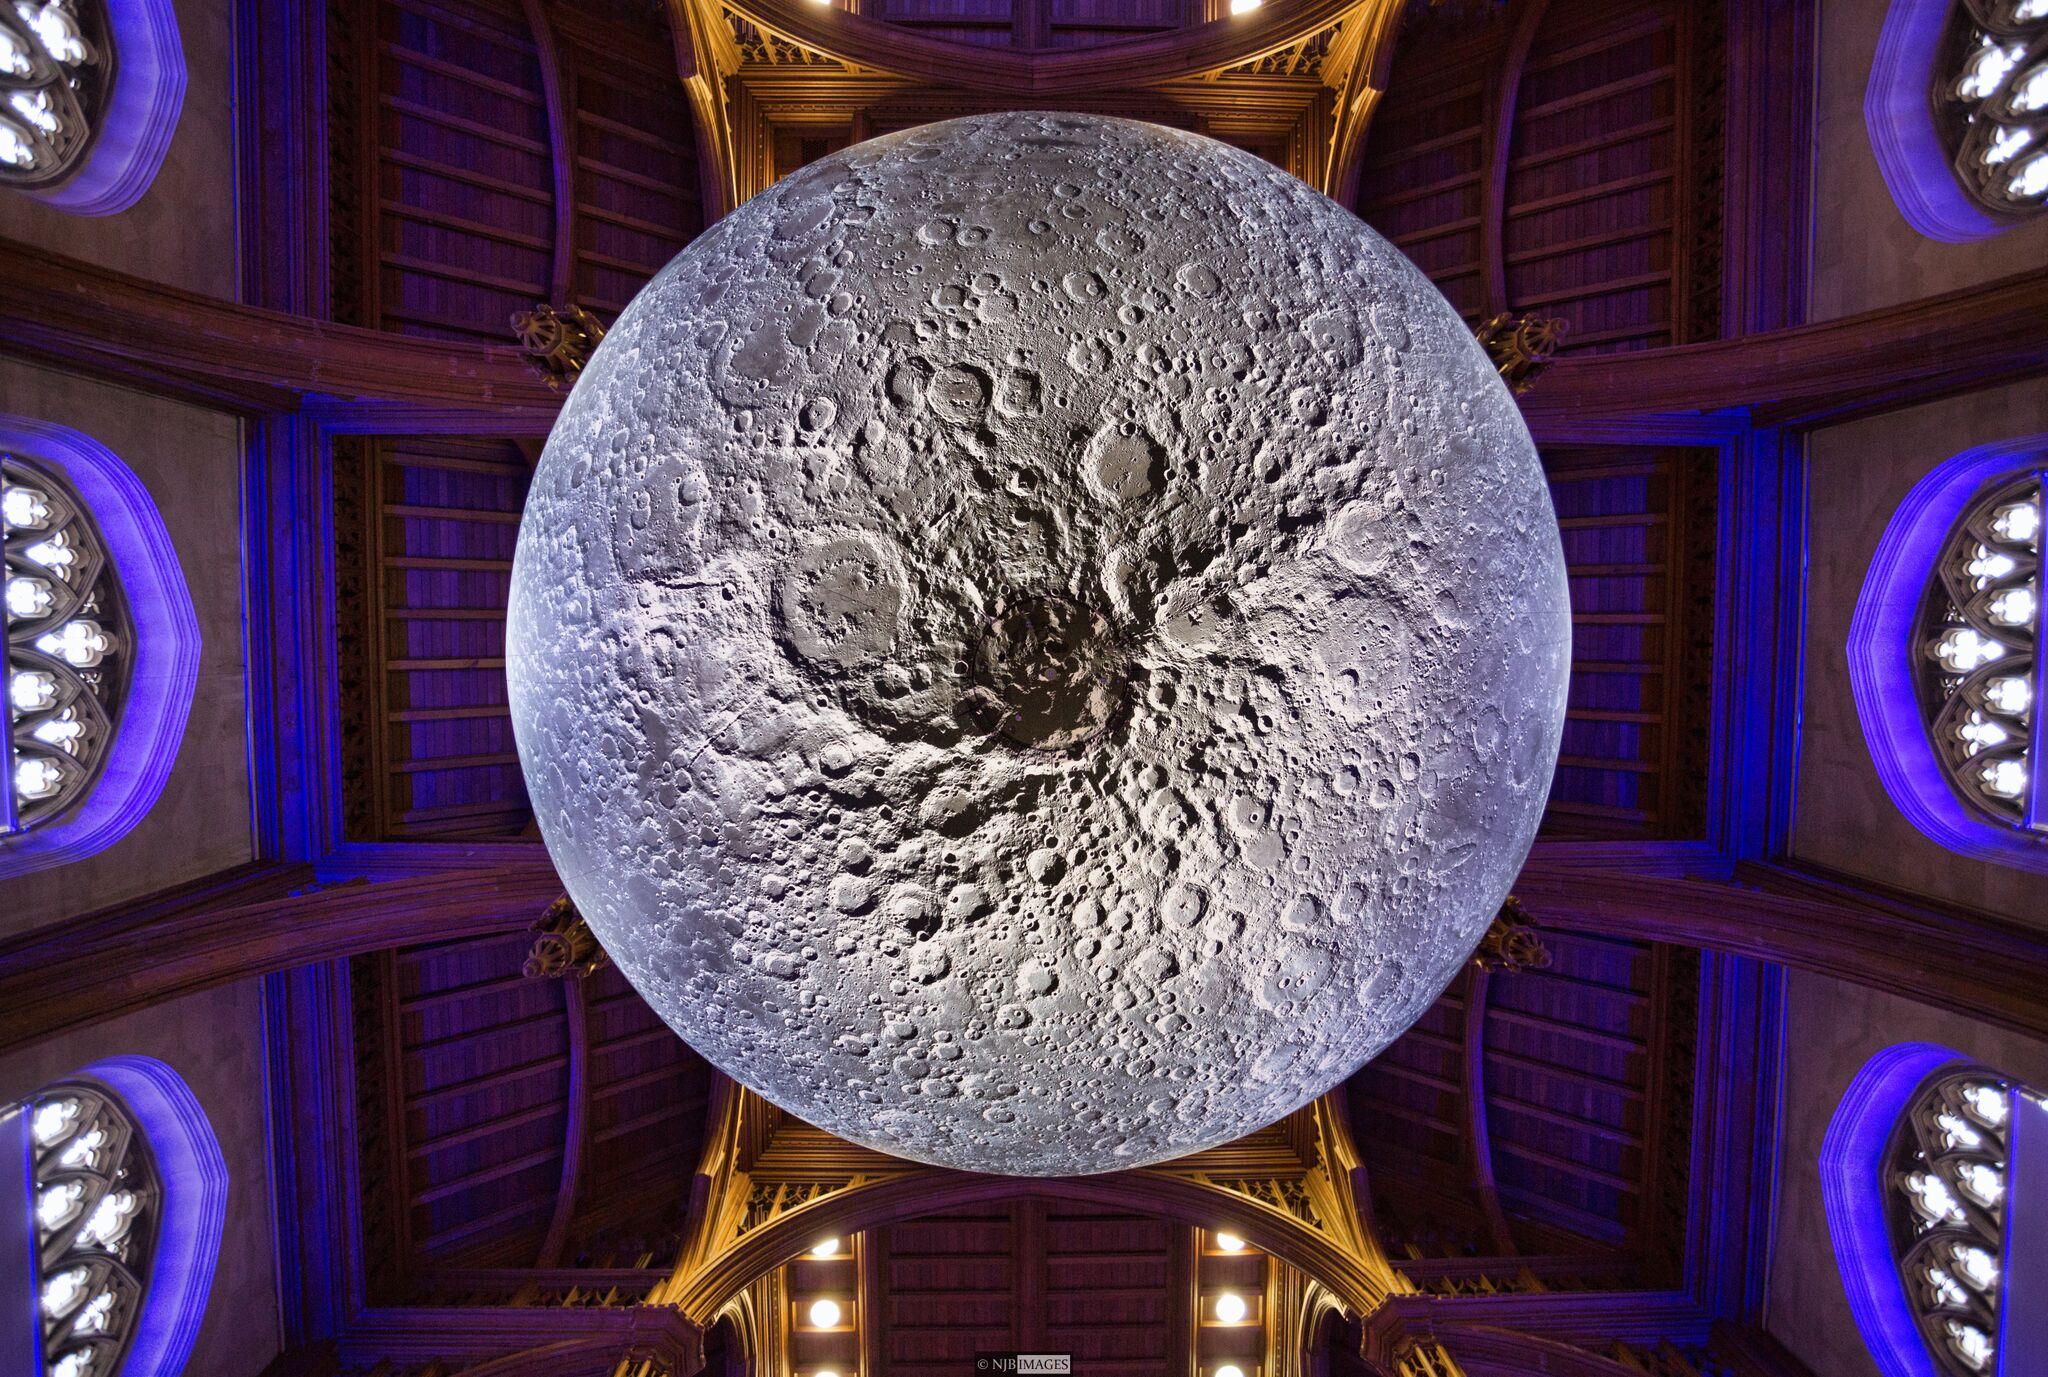 Luke Jerram, Museum of the Moon at University of Bristol